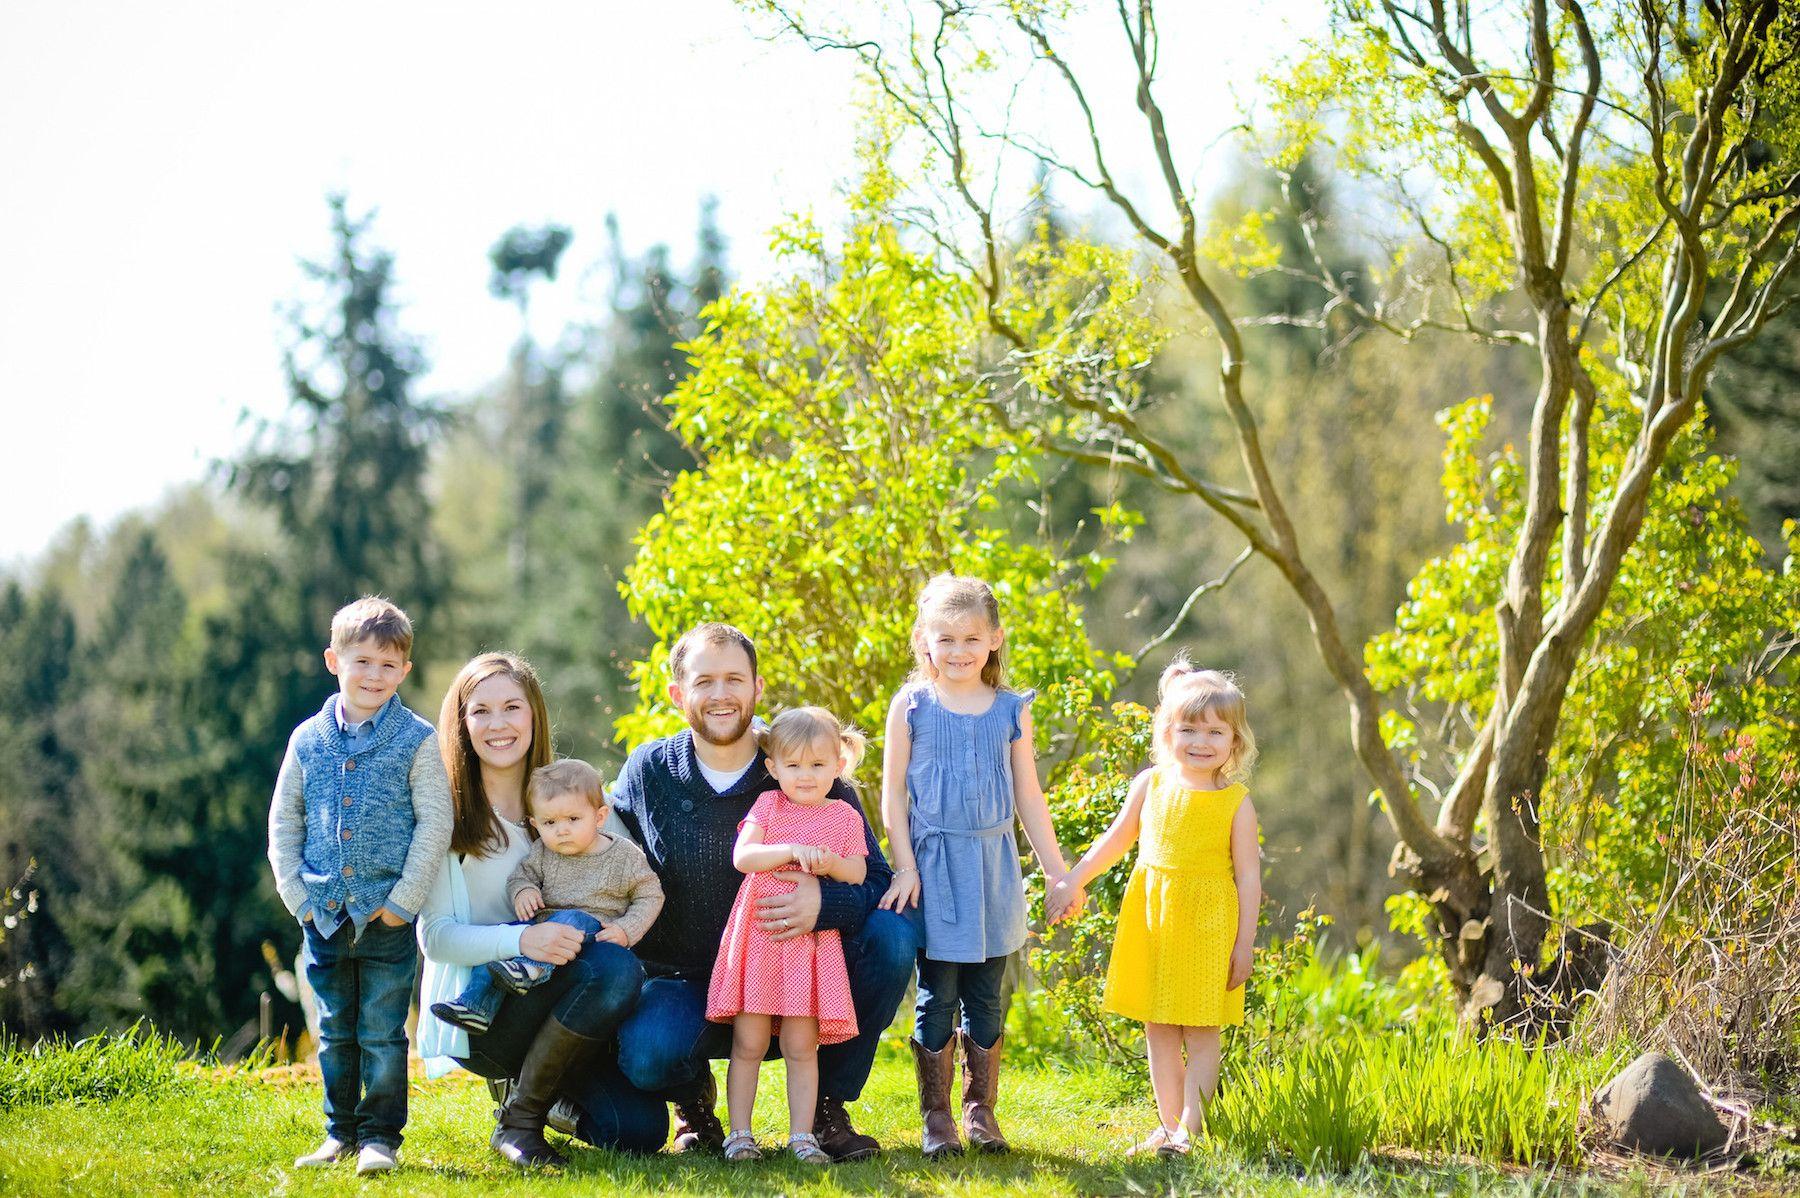 joe stout and family